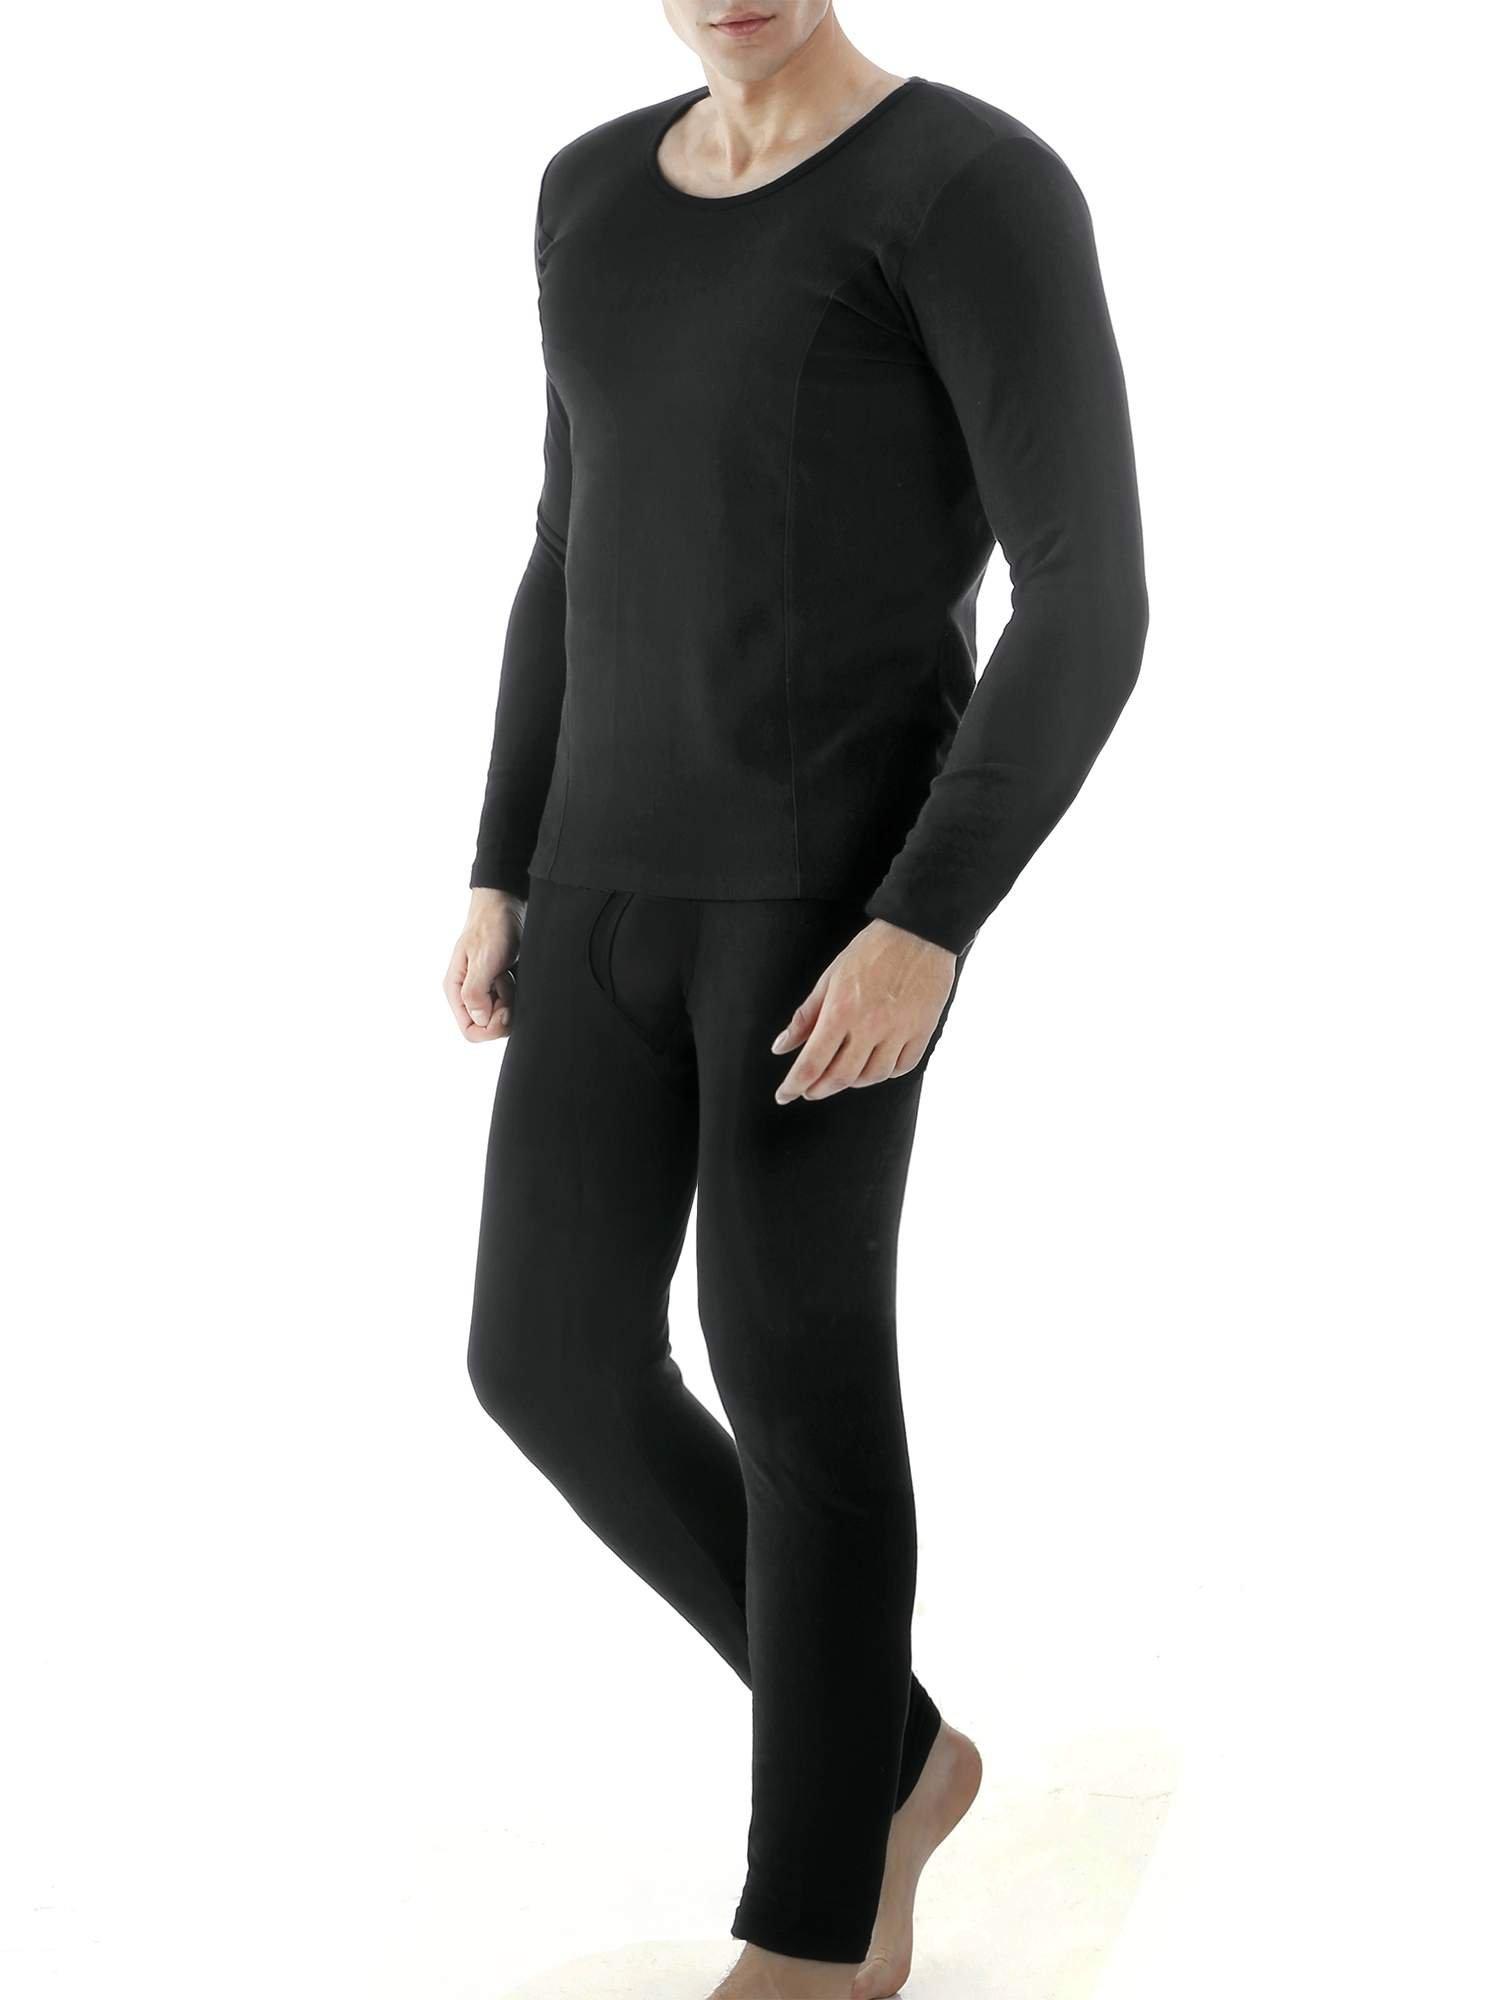 Ekouaer Men's Winter Thermal Long Sleeve Shirts&Fleece Lined Leggings(Black,Medium)